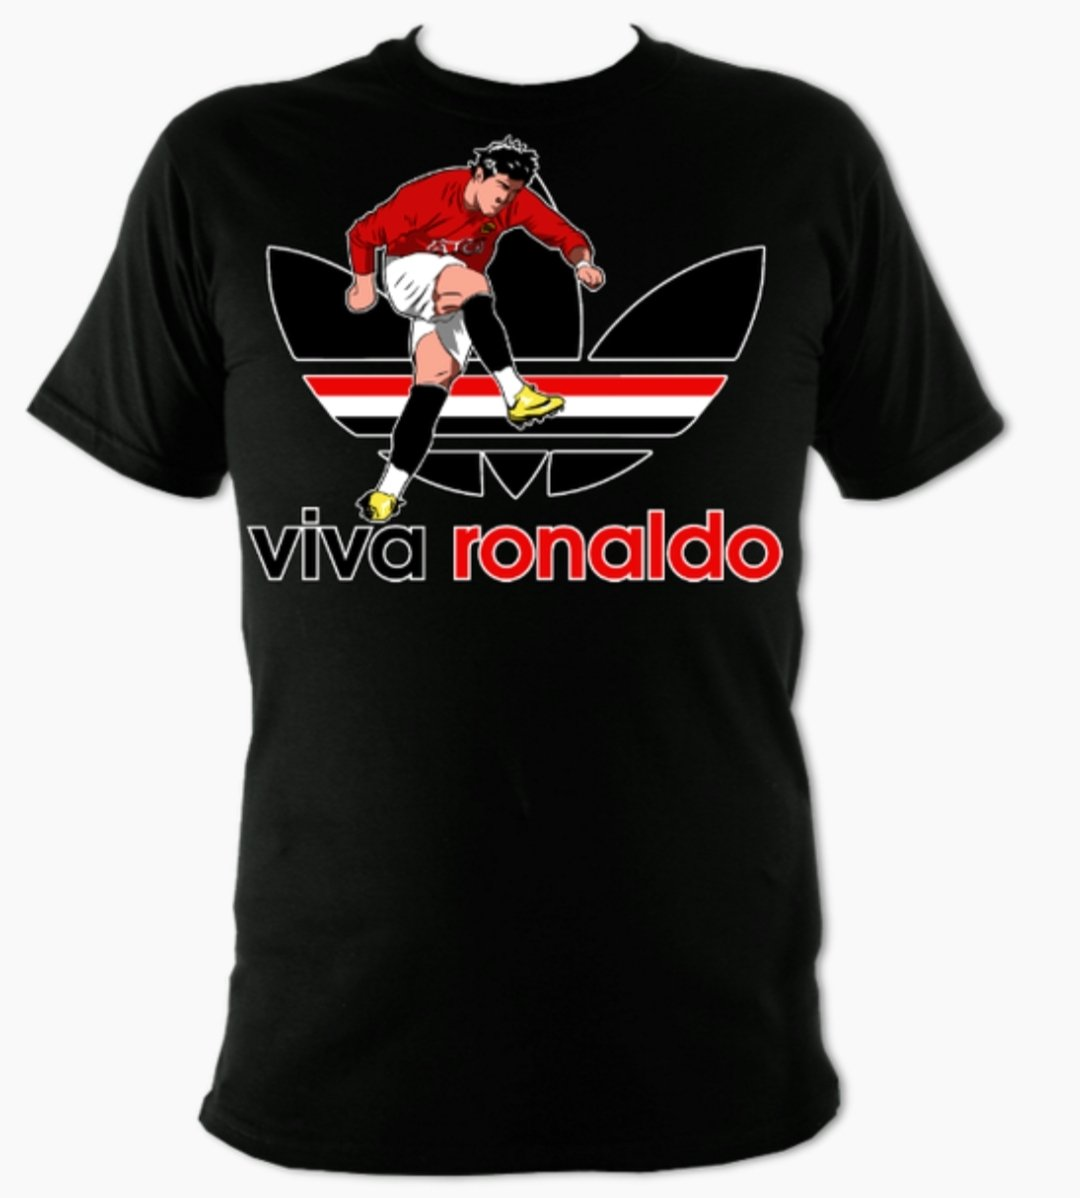 *GIVEAWAY* I'm giving away one of these adoRED 'Viva Ronaldo' Tshirts *LARGE ONLY*  To Enter: 1. RT this Tweet 2. Follow @NicwMUFC  Winner announced at @7pm Sunday 19/9/21  Good Luck. #MUFC #ManUtd #adoRED #VivaRonaldo #RonaldoReturns #Ronaldo